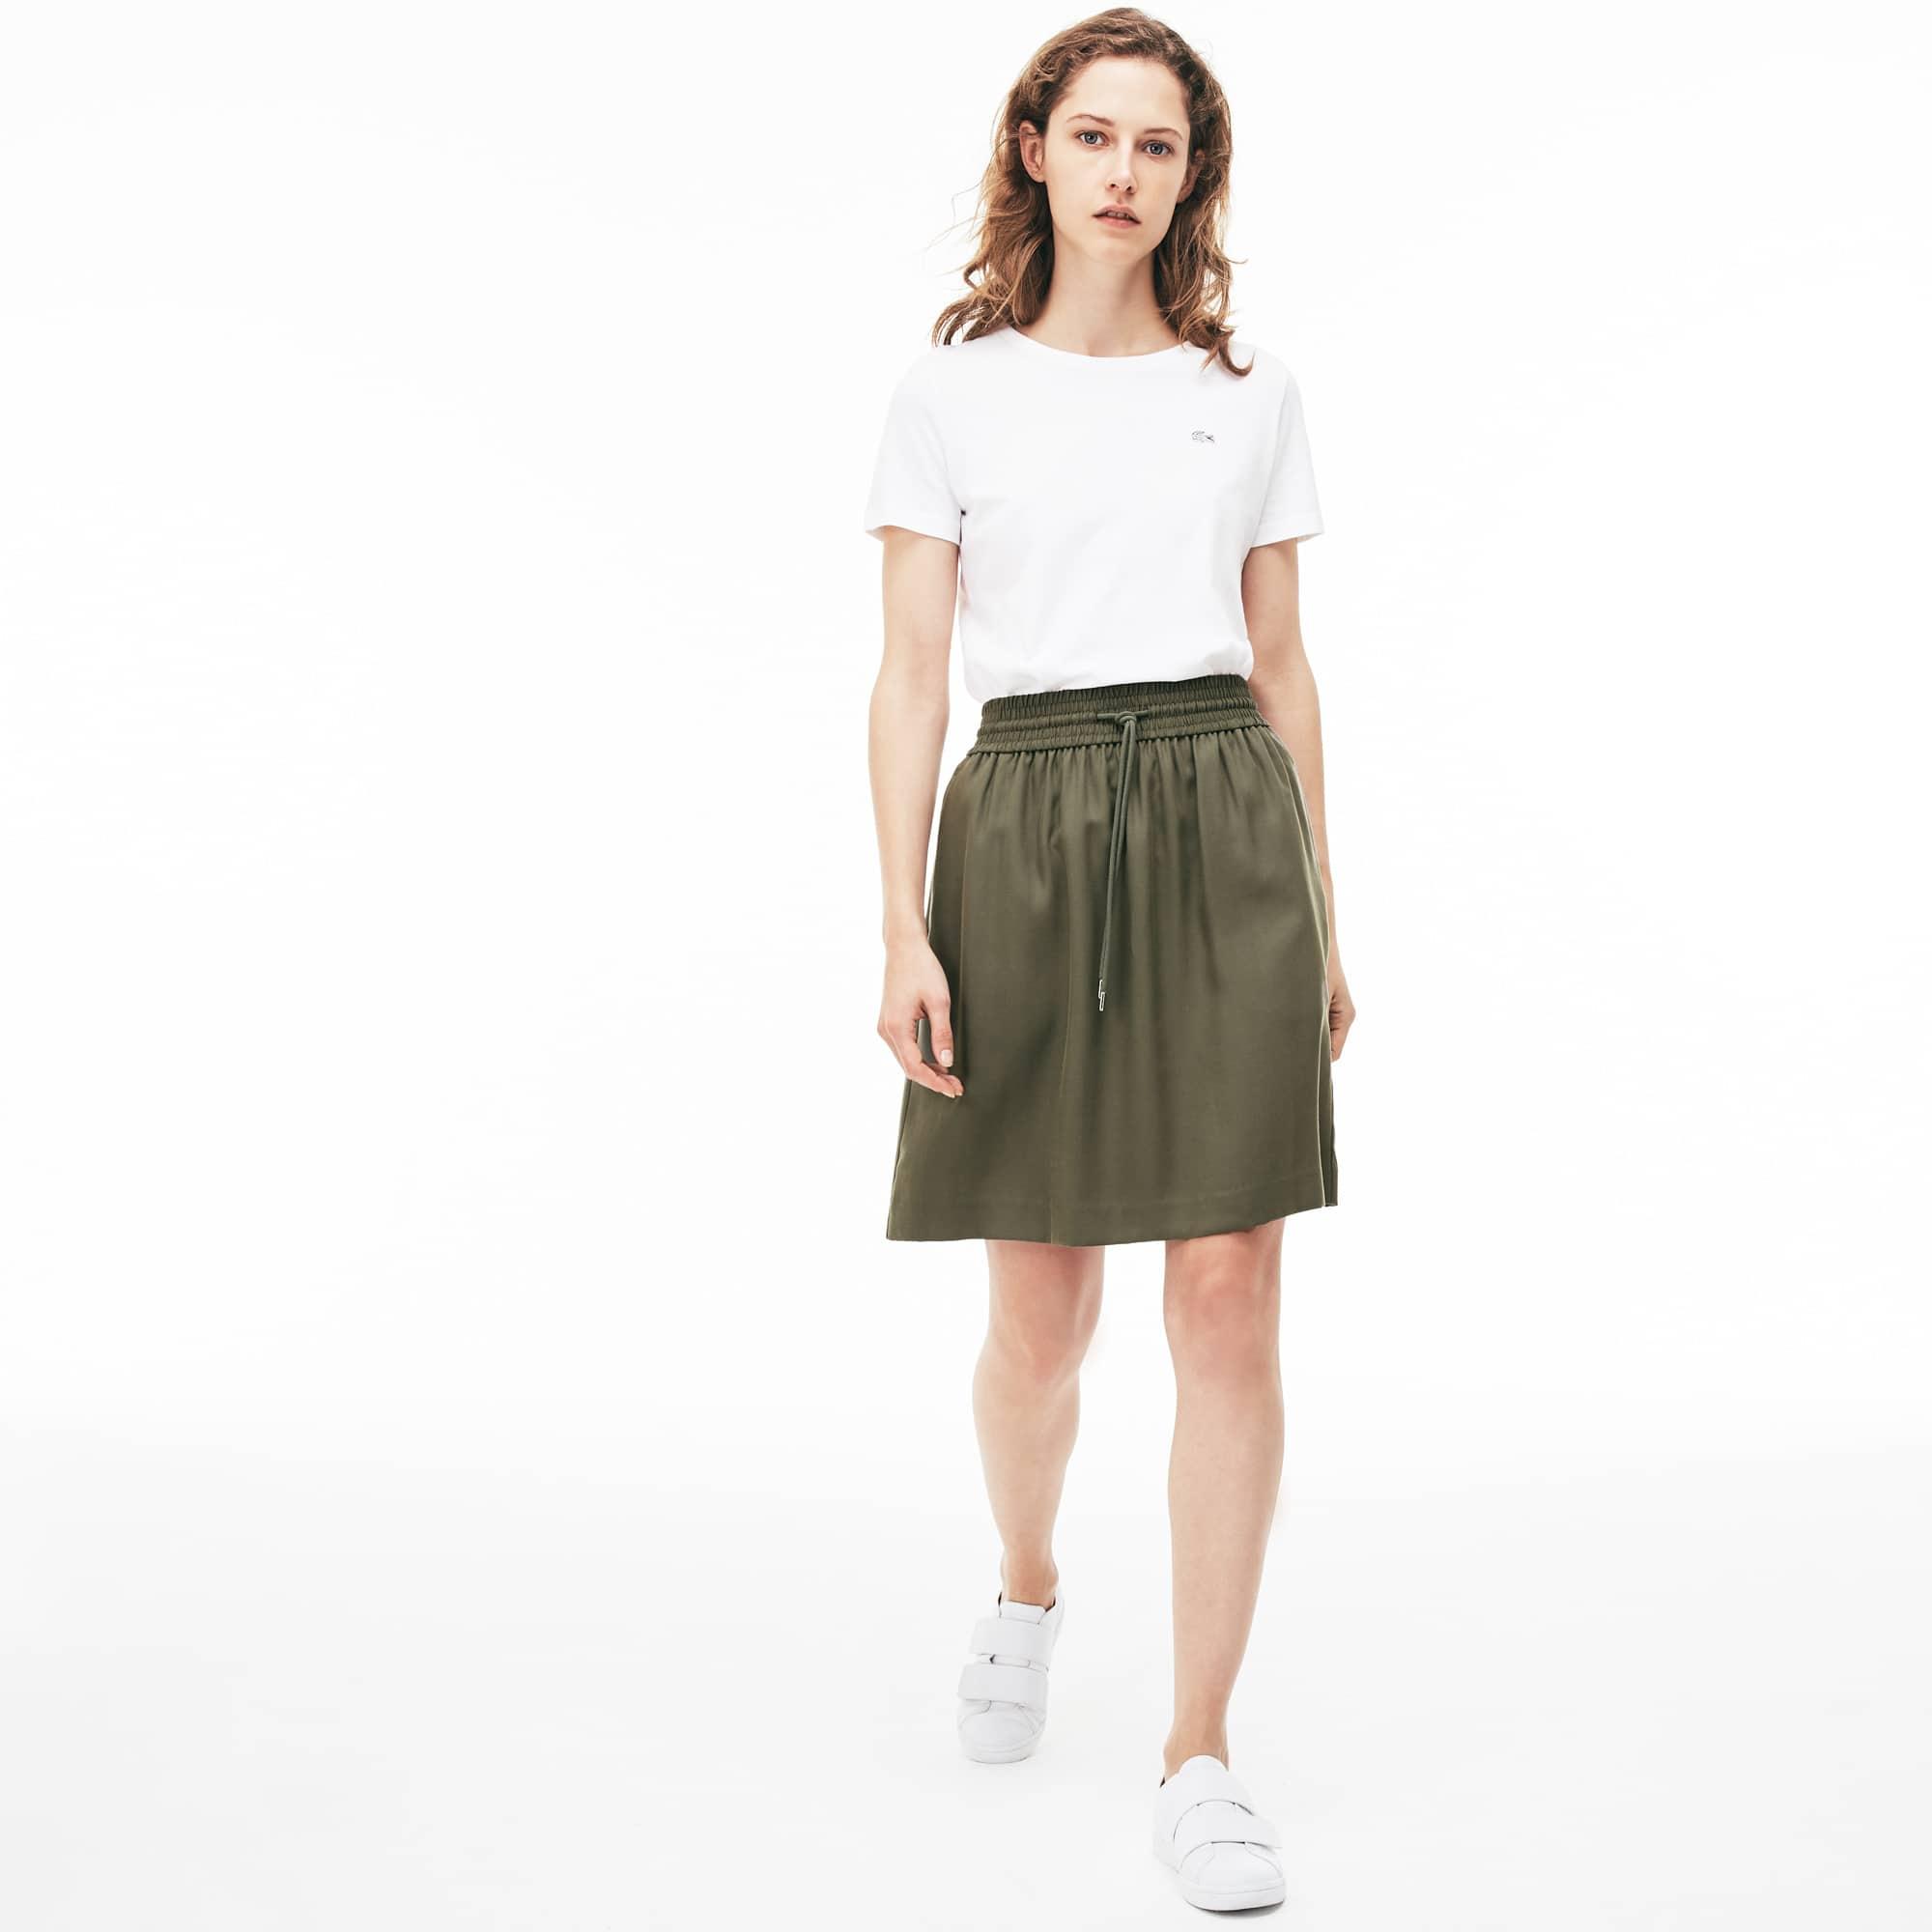 Women's Elasticized Waistband Piqué Mid-Length Skirt